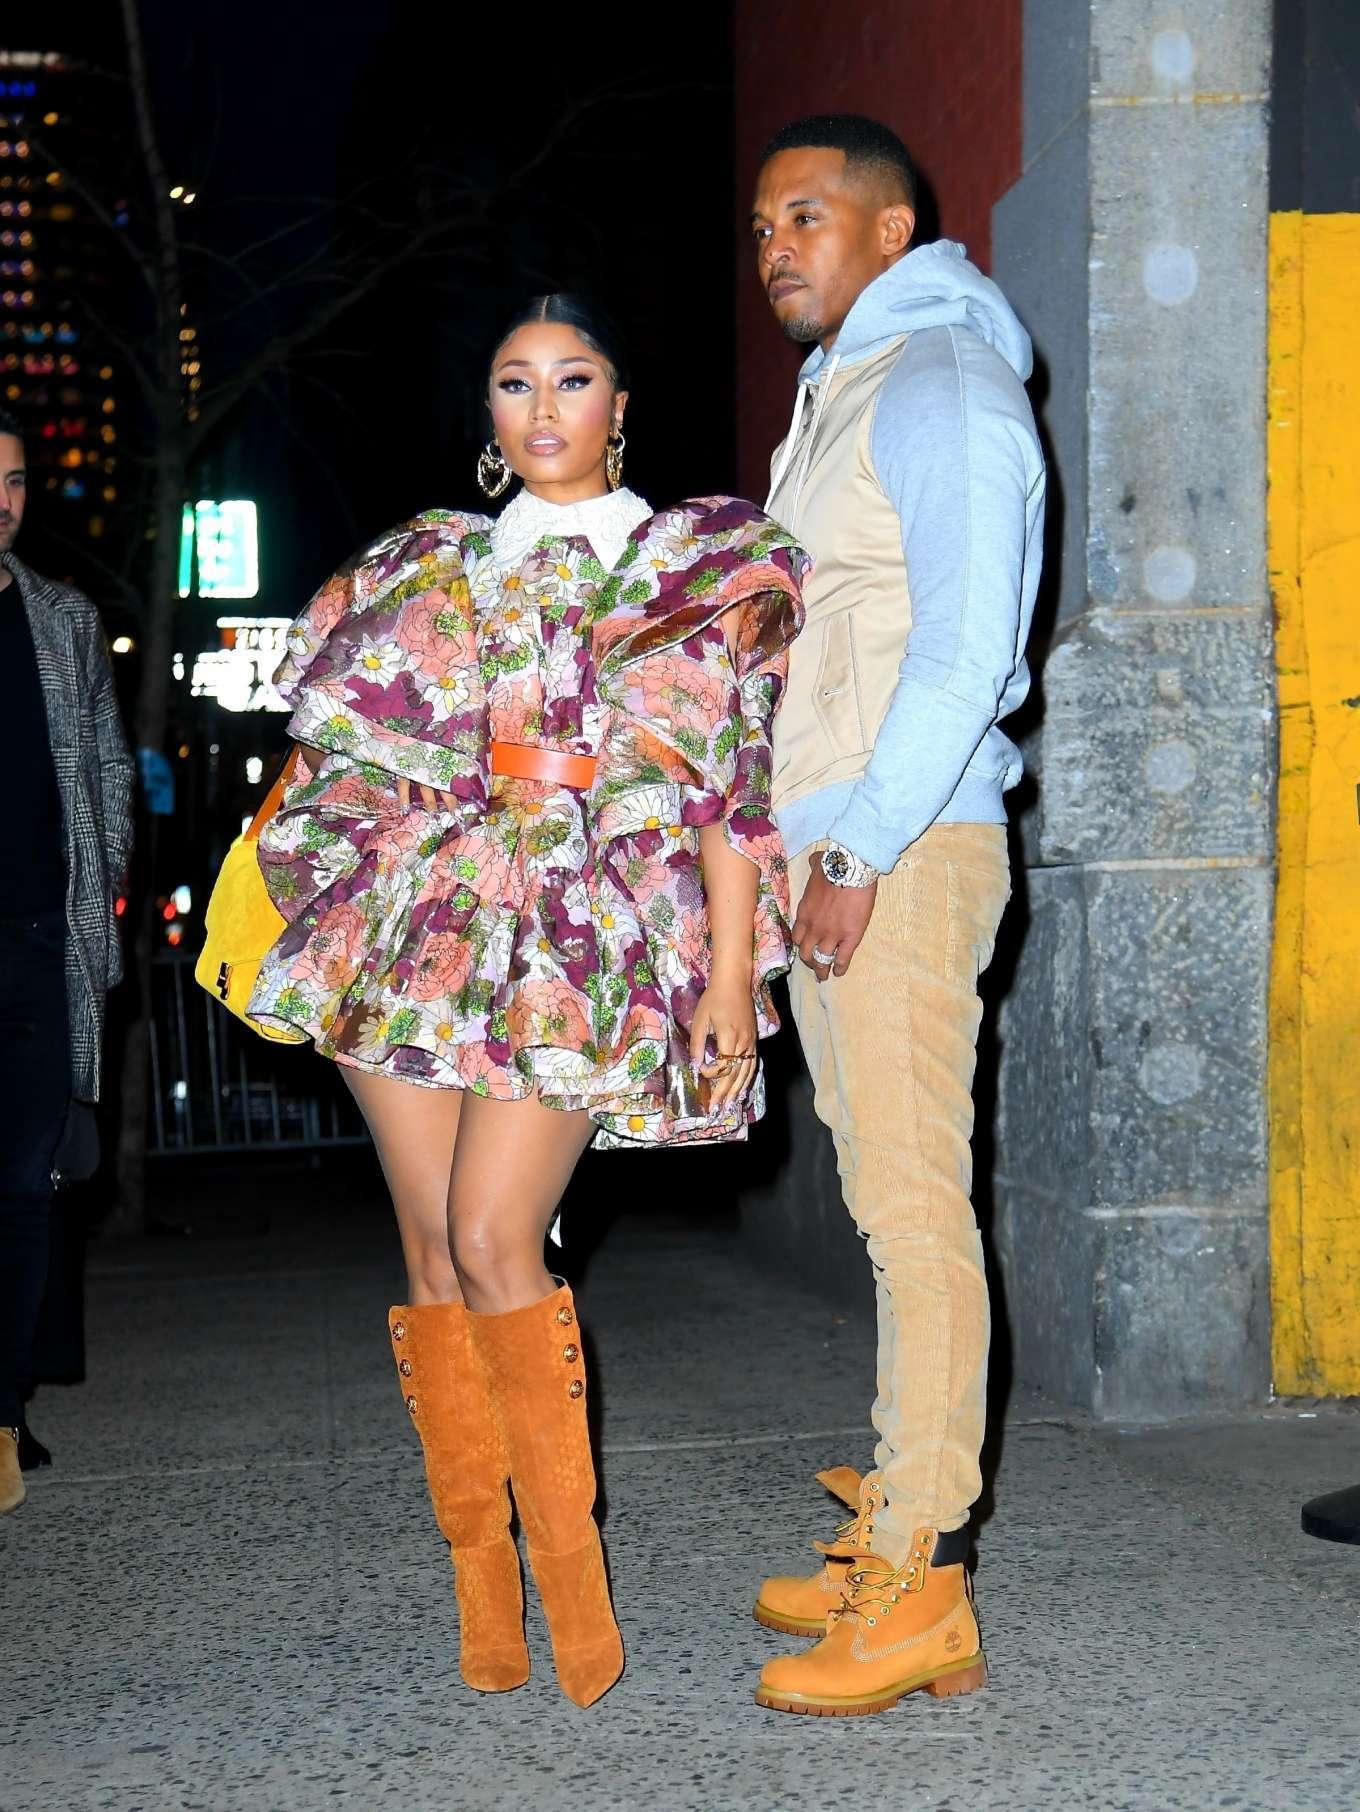 Nicki Minaj - Seen at the Marc Jacobs fashion show in New York City